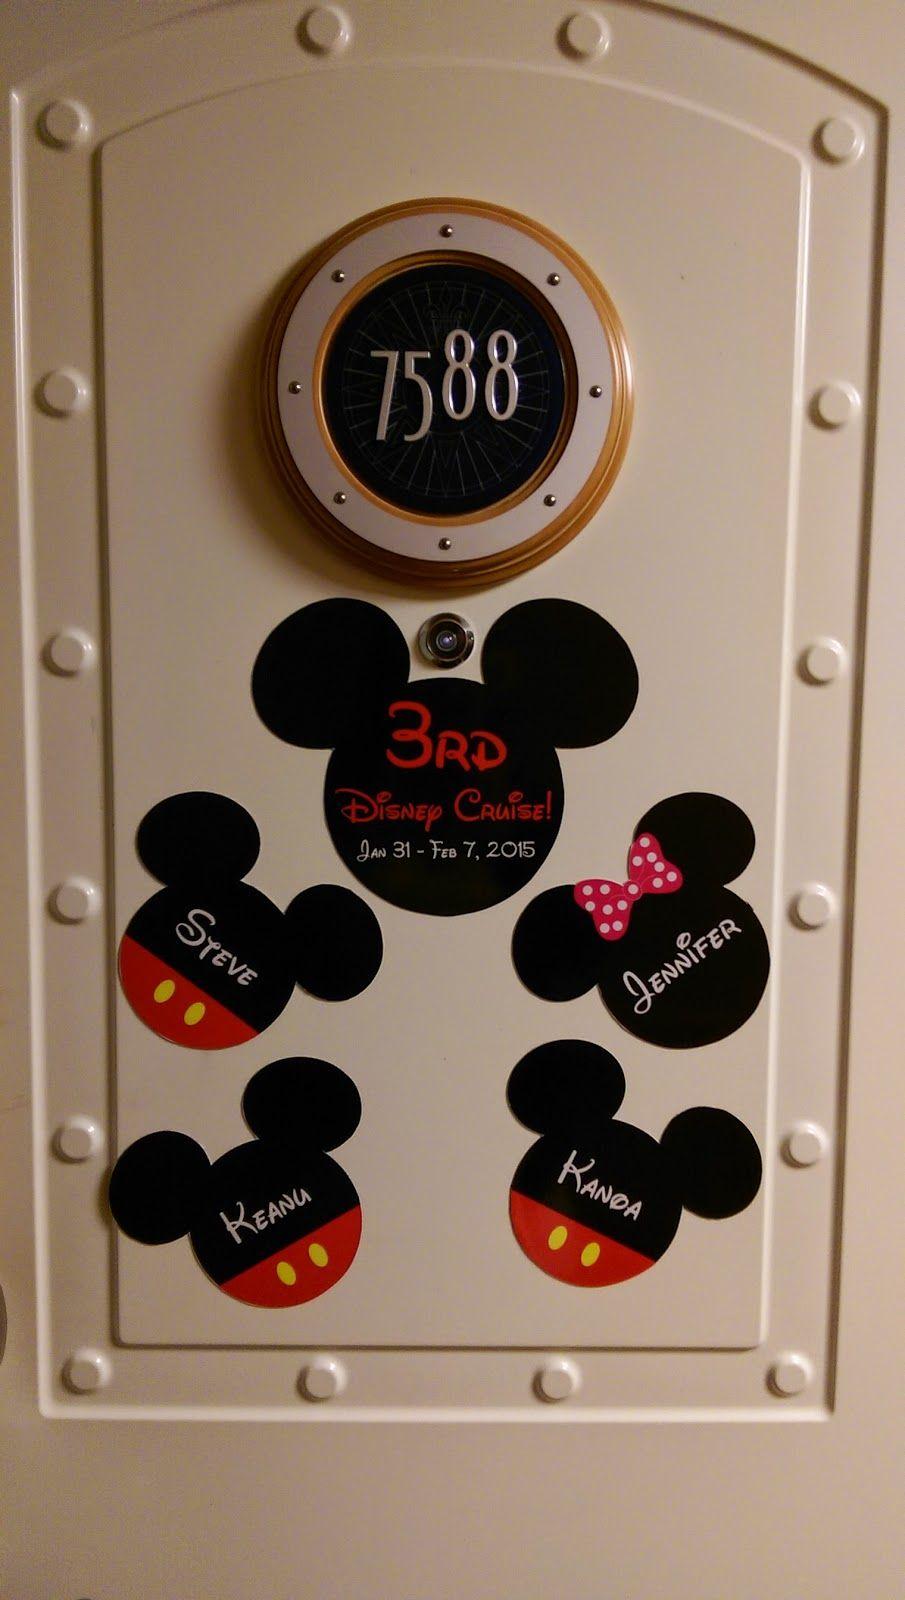 Disney Cruise Door Magnet Ideas Disney Cruise Door Disney Cruise Door Magnets